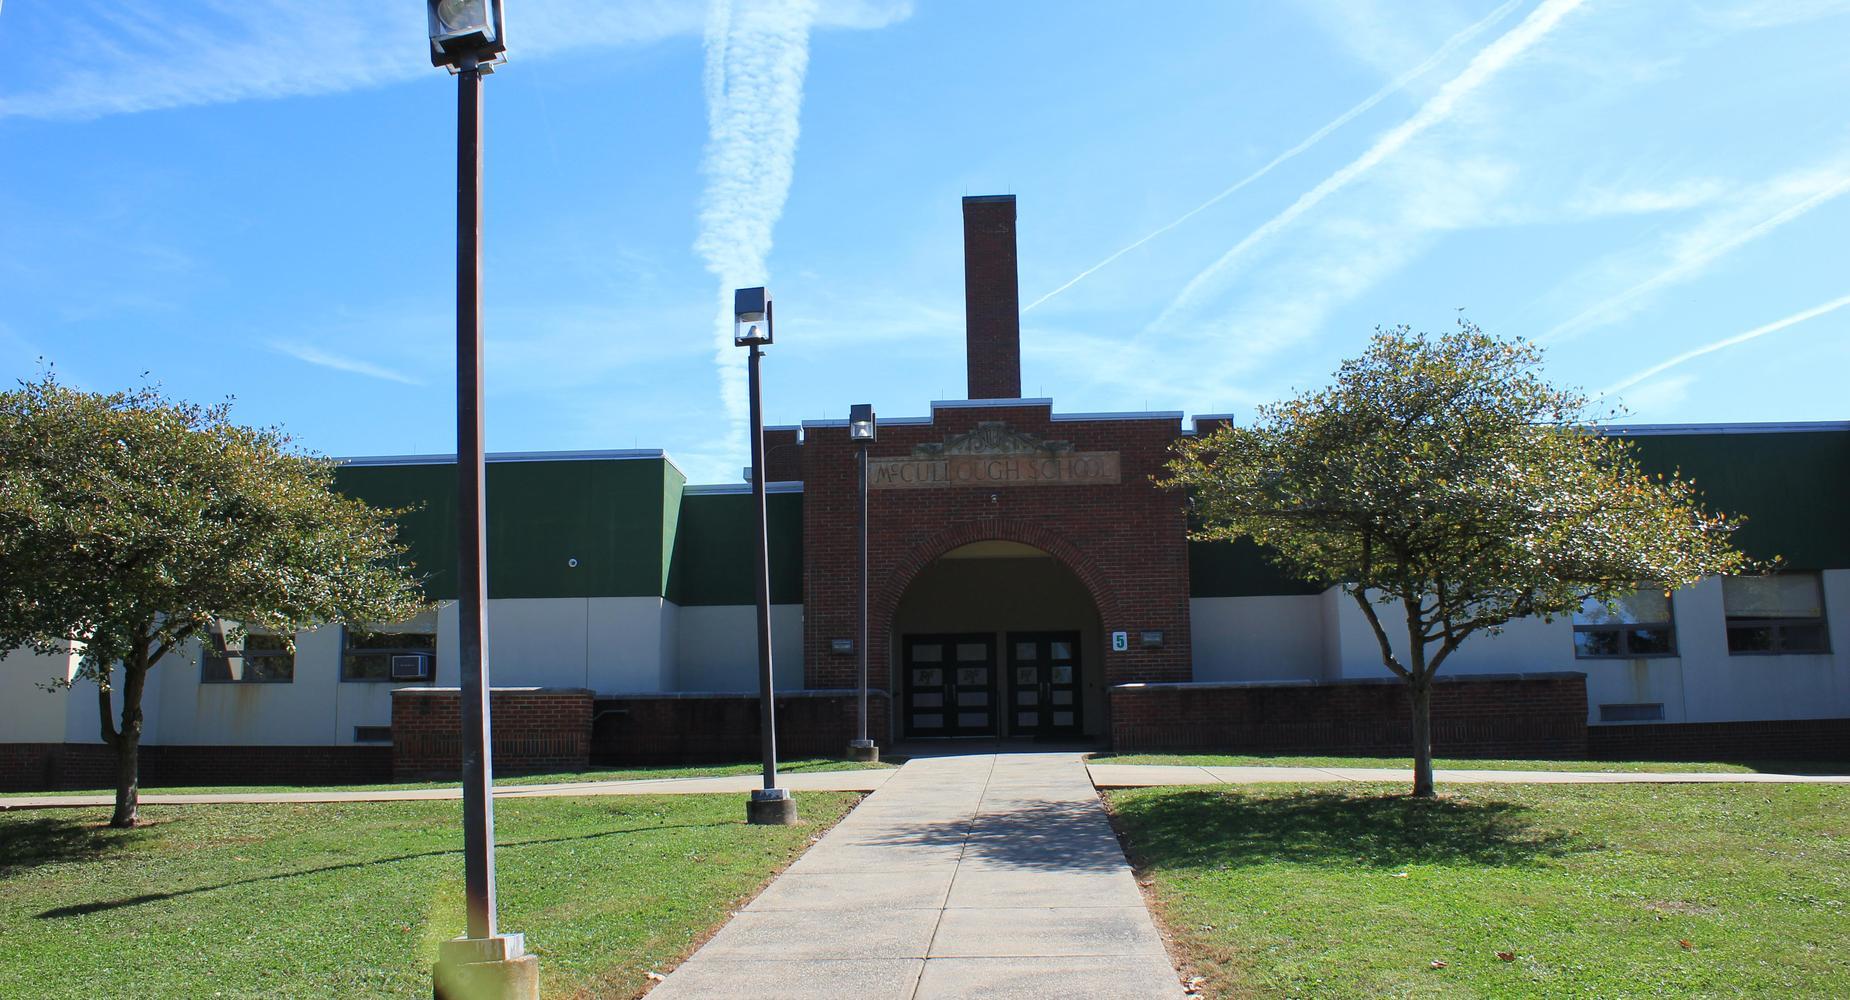 Exterior of McCullough Elementary School